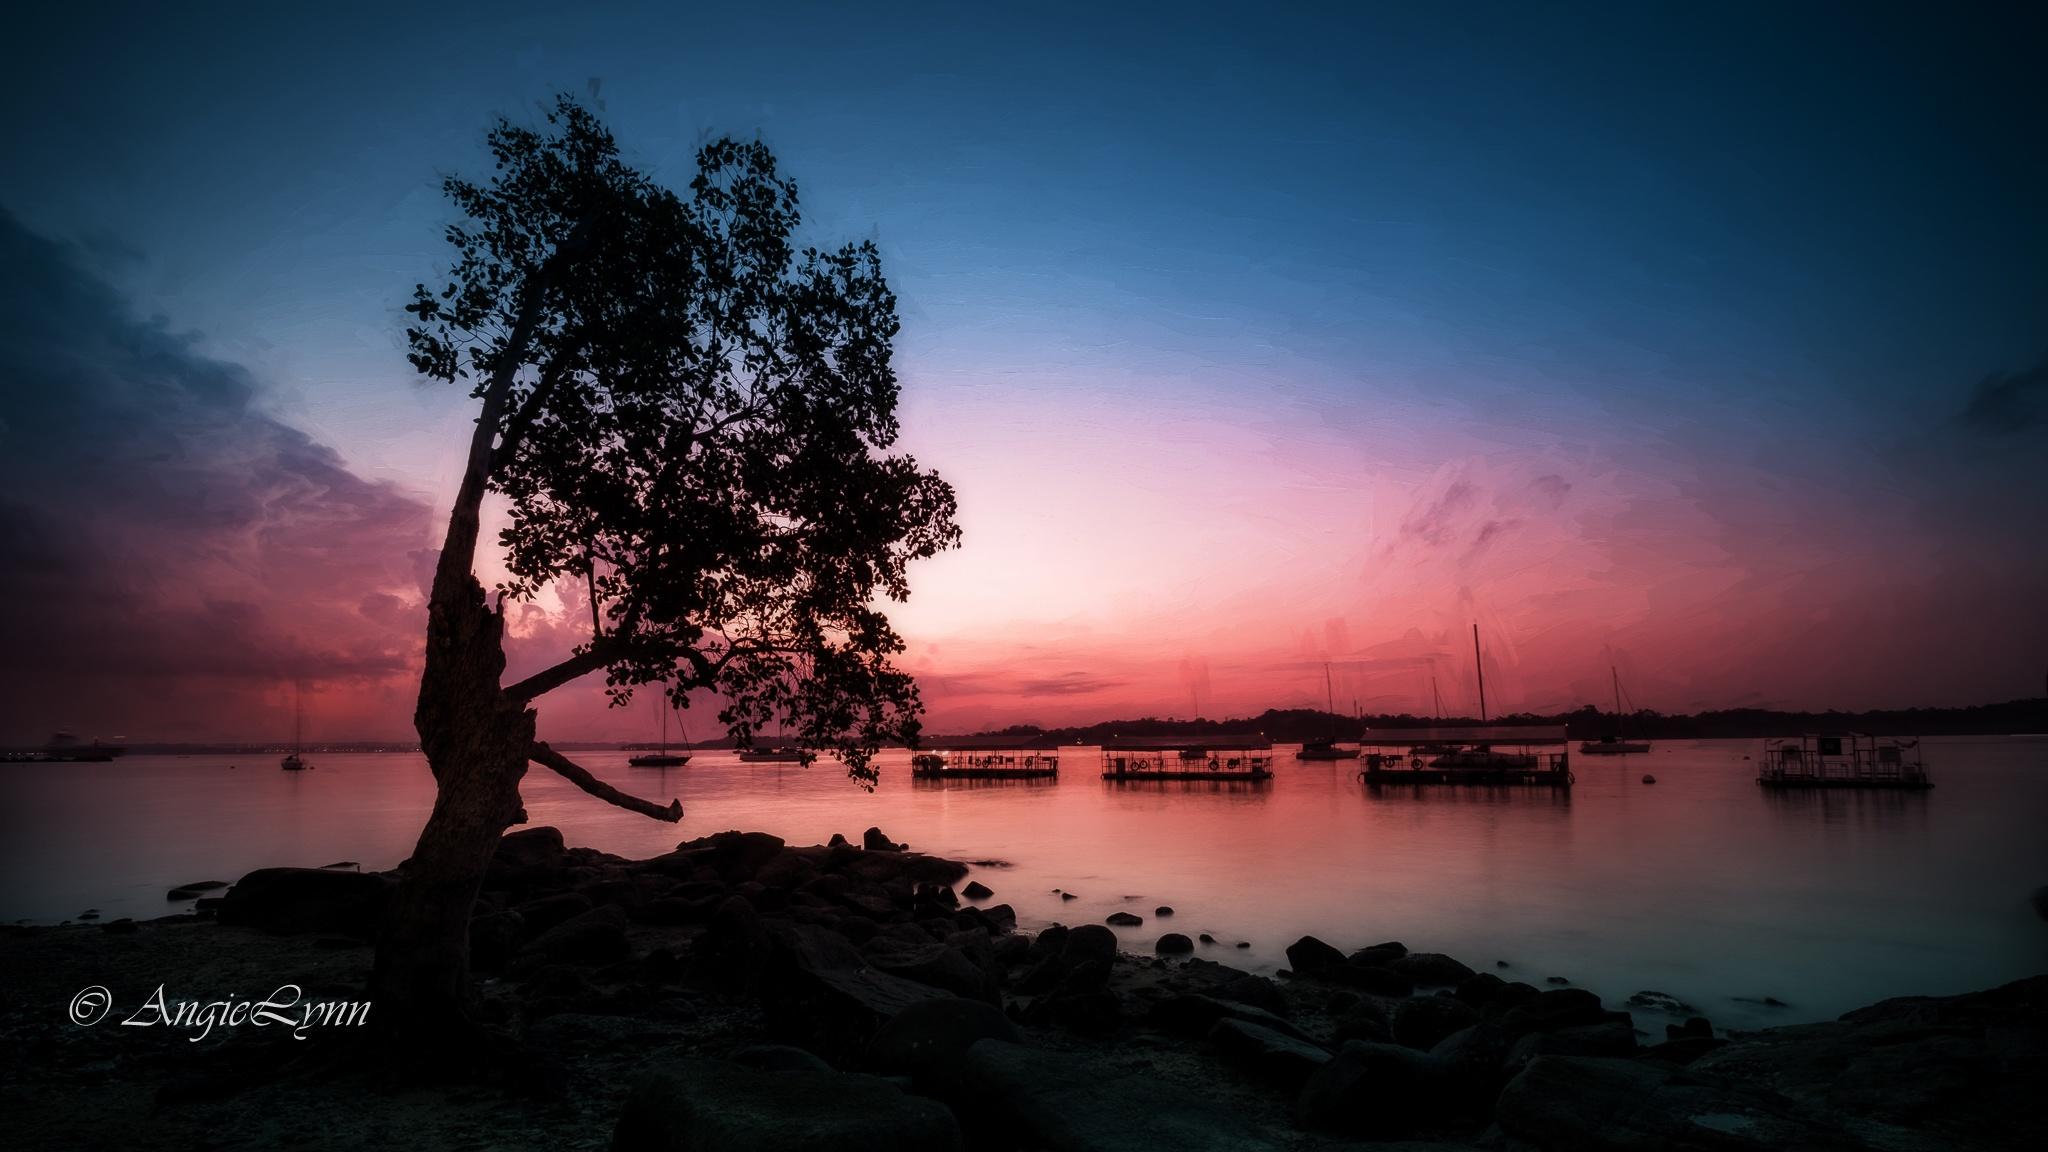 Alone at dusk by AngieLynn